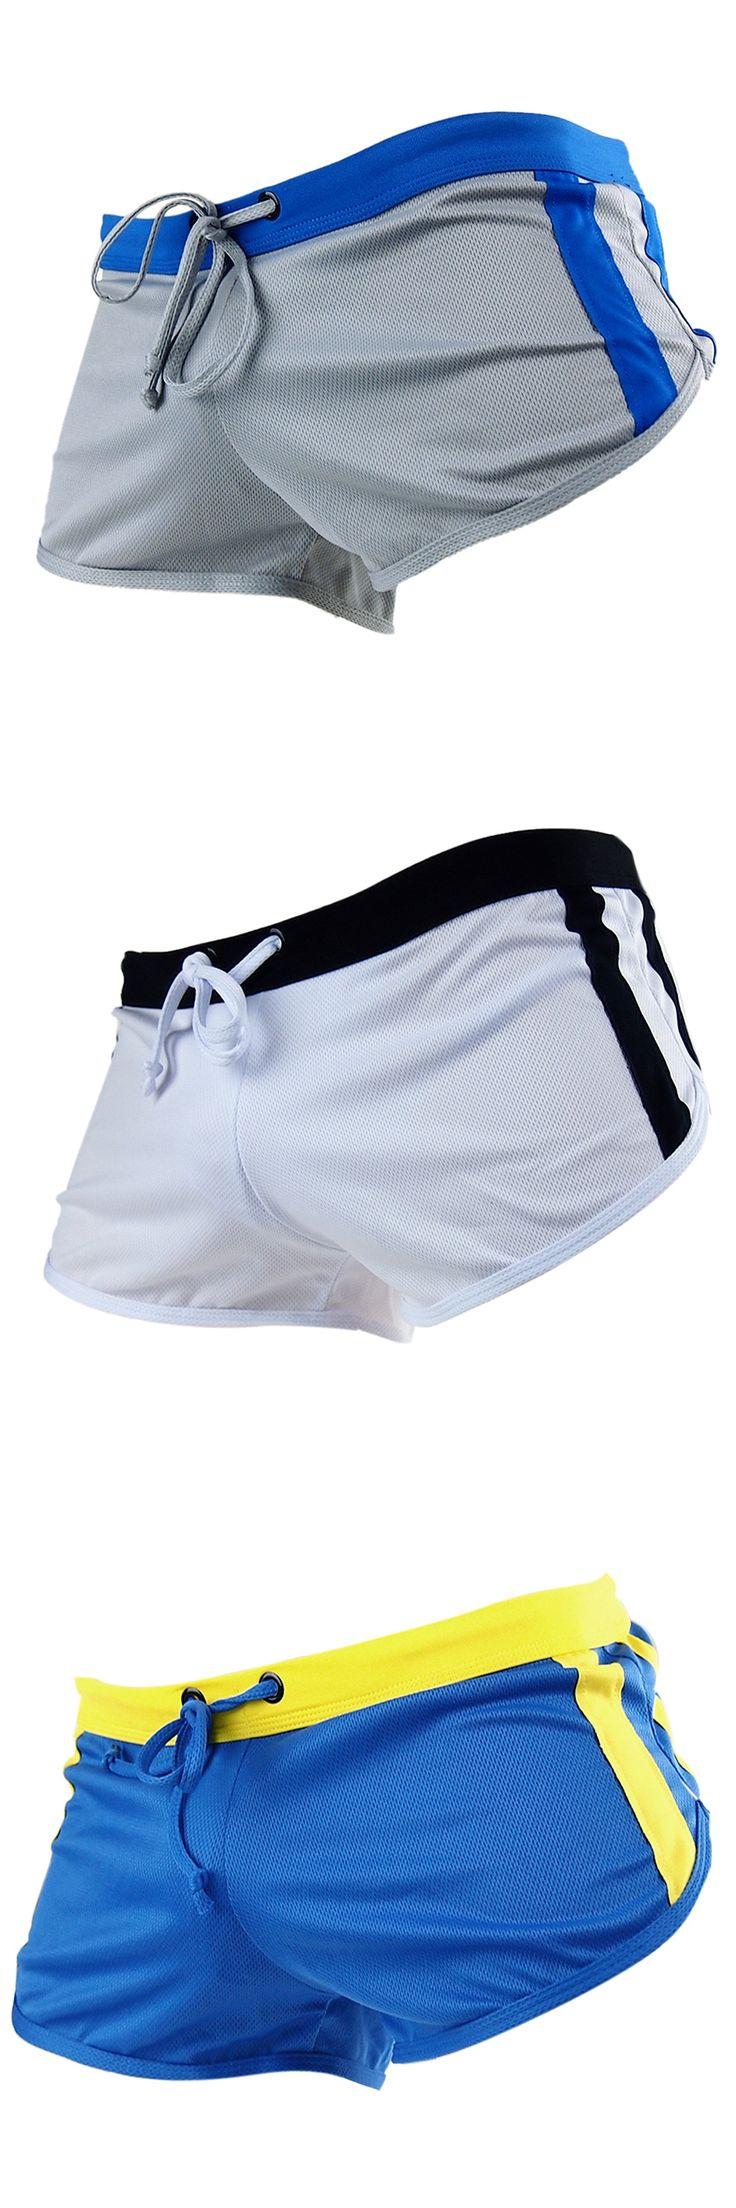 Men  trunks beach board shorts workout shorts